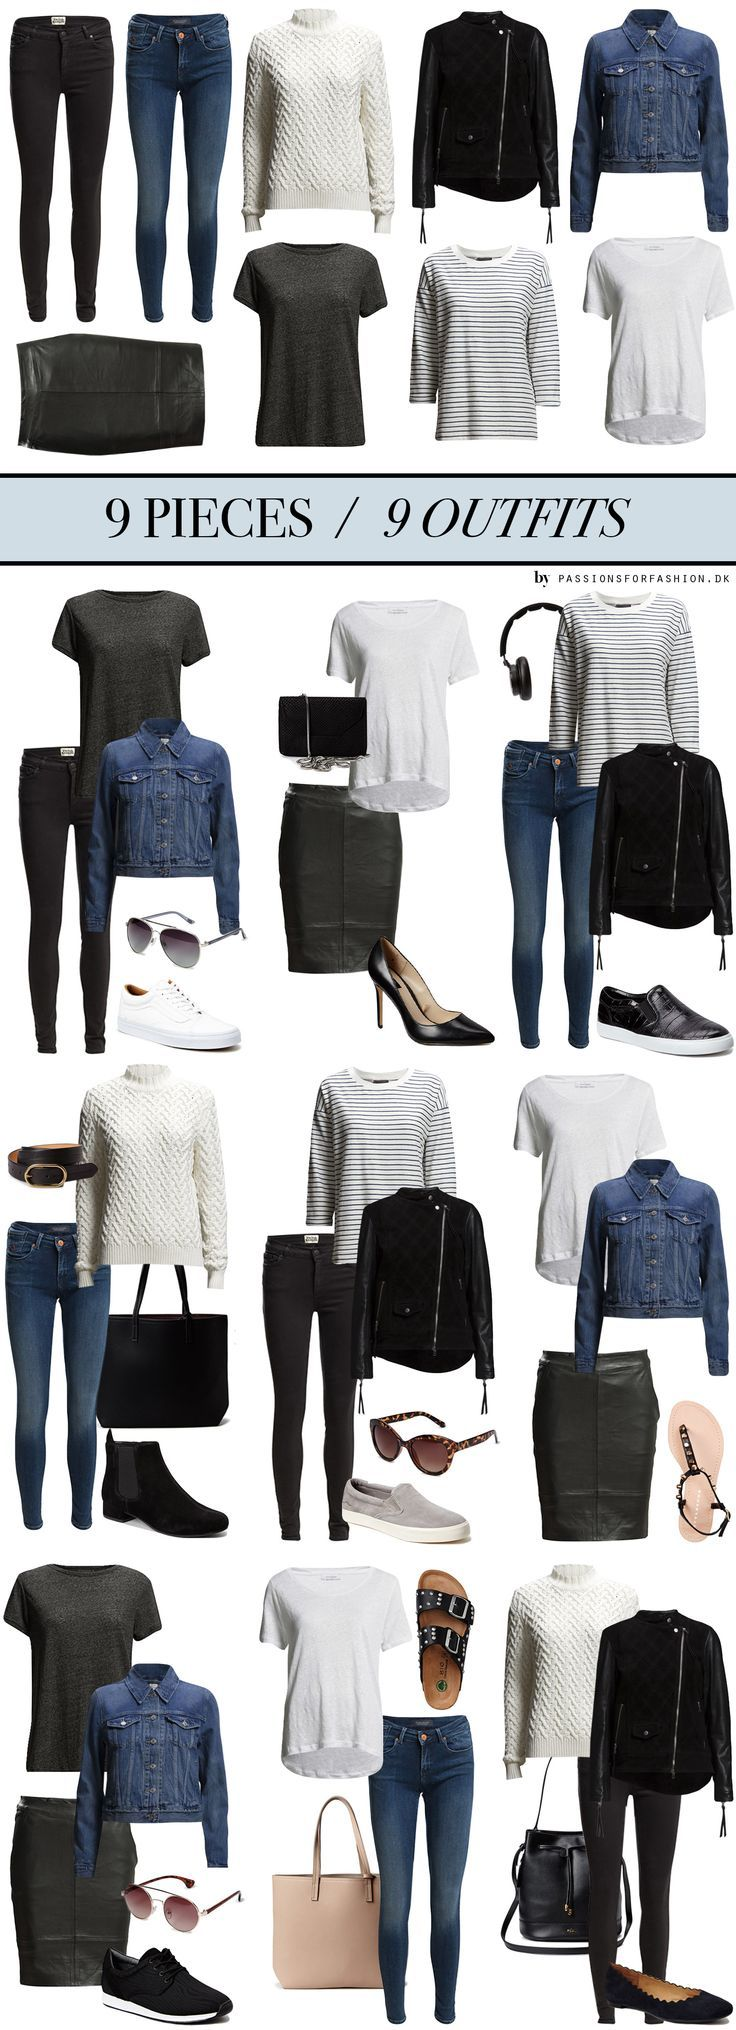 Combina moda con estas 9 piezas de ropa con passionsforfashio... Outfit Moda Combina TuRopa #Mylifemystyle